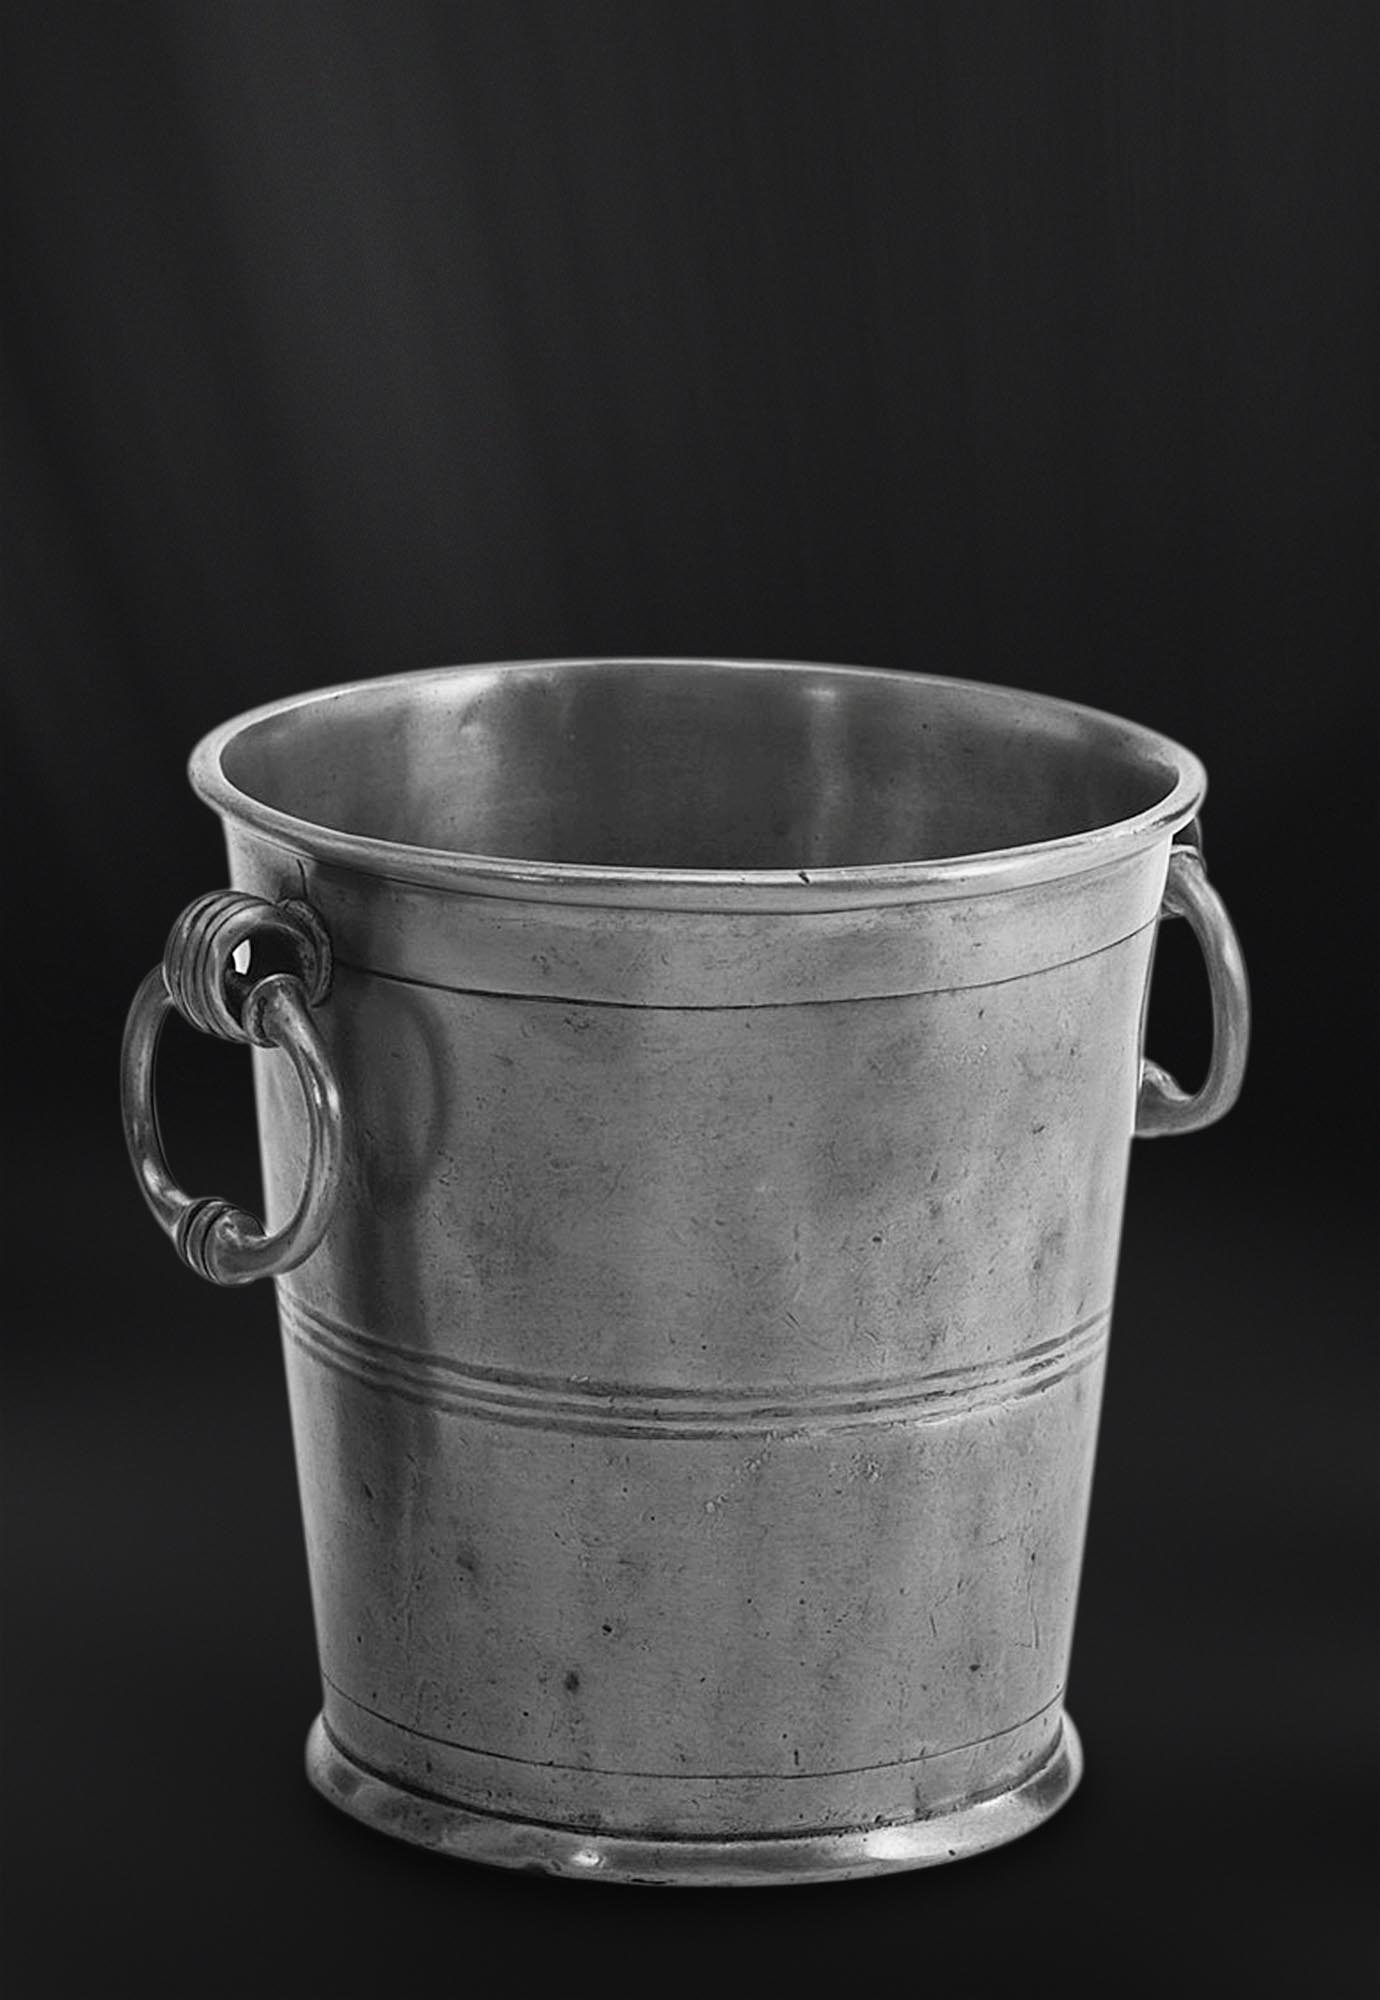 SEAU CHAMPAGNE etain antique